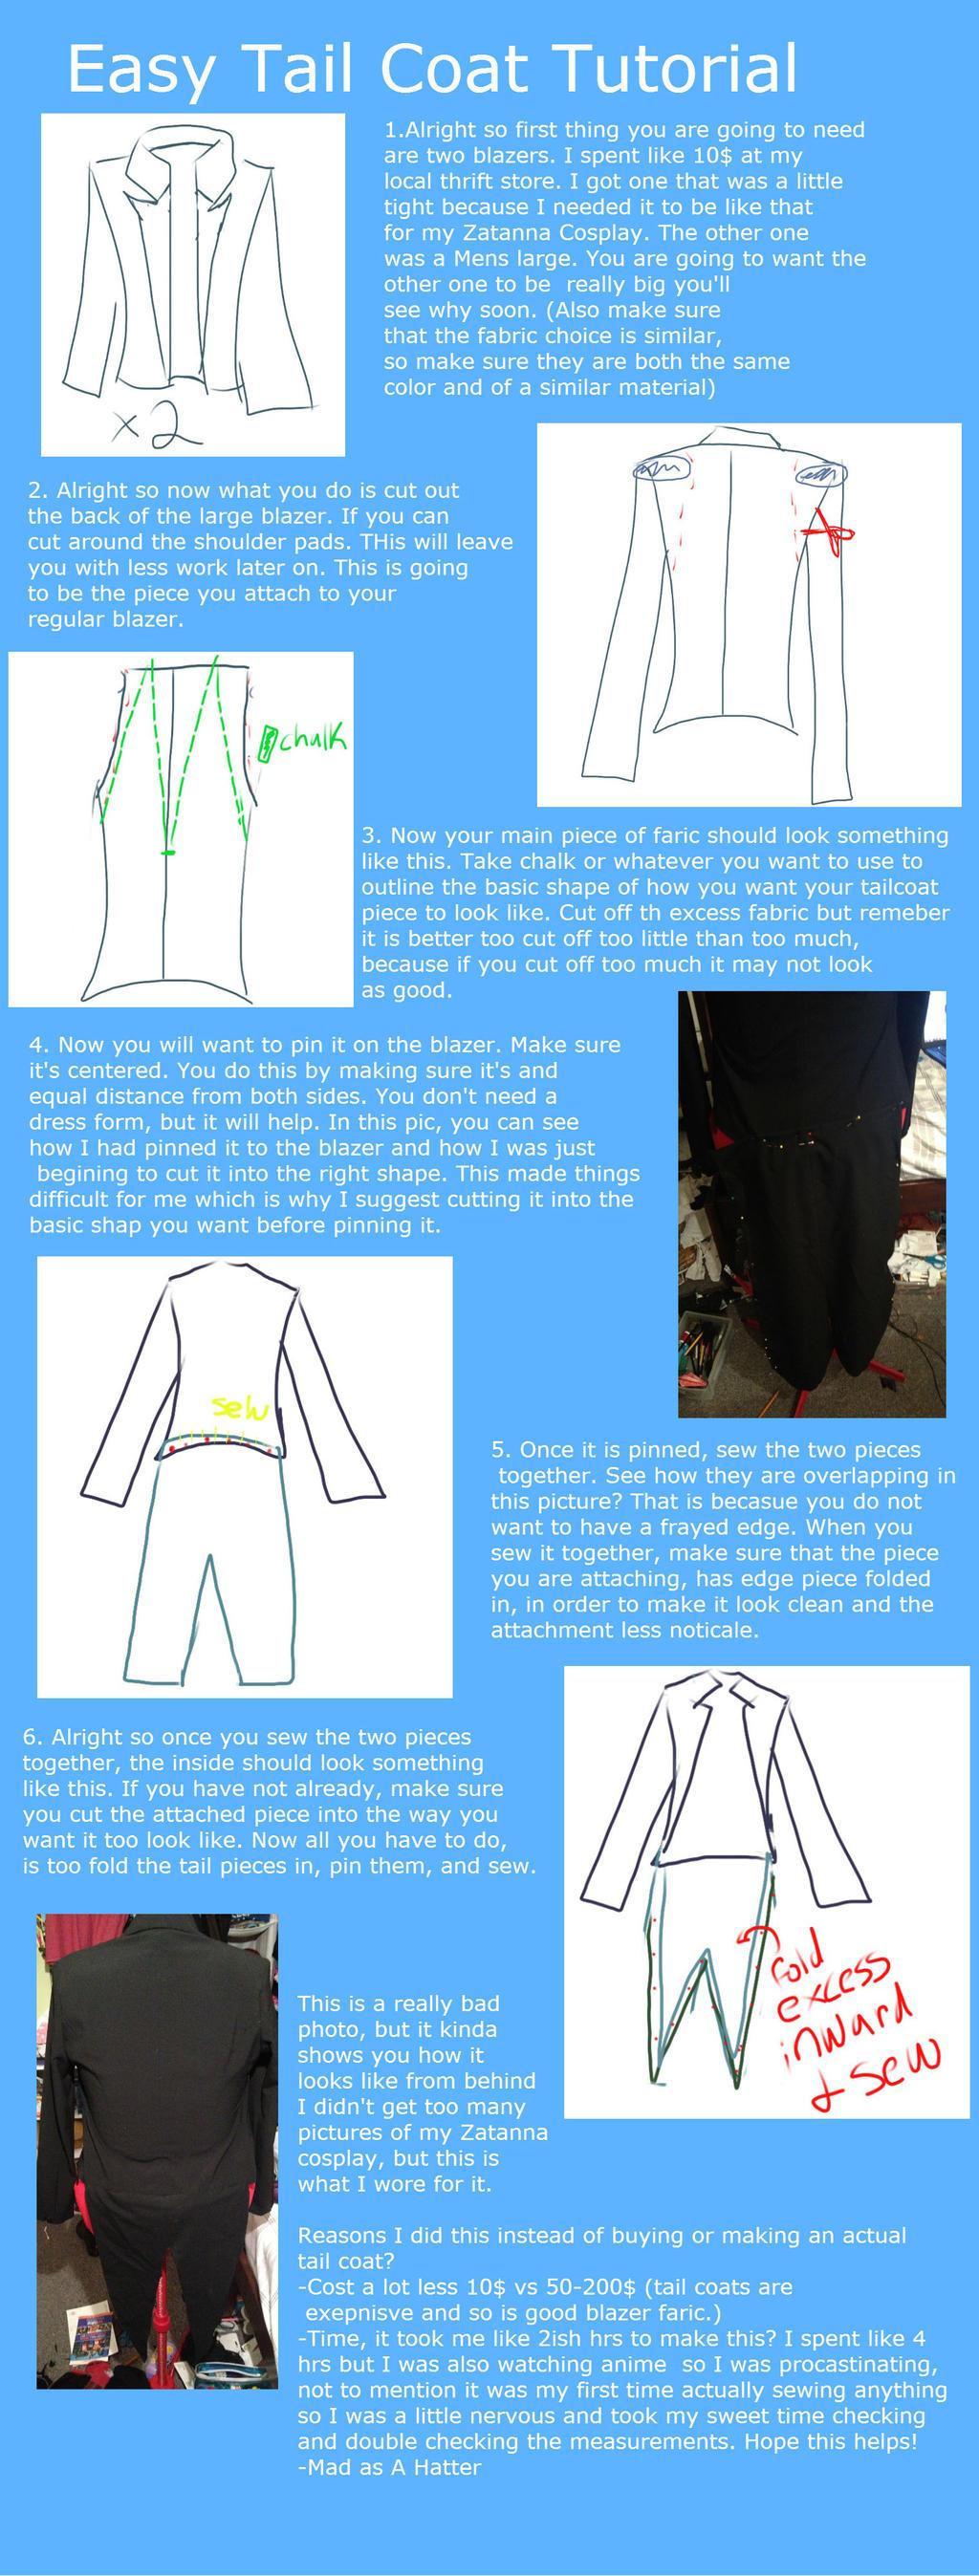 Easy Tail Coat tutorial